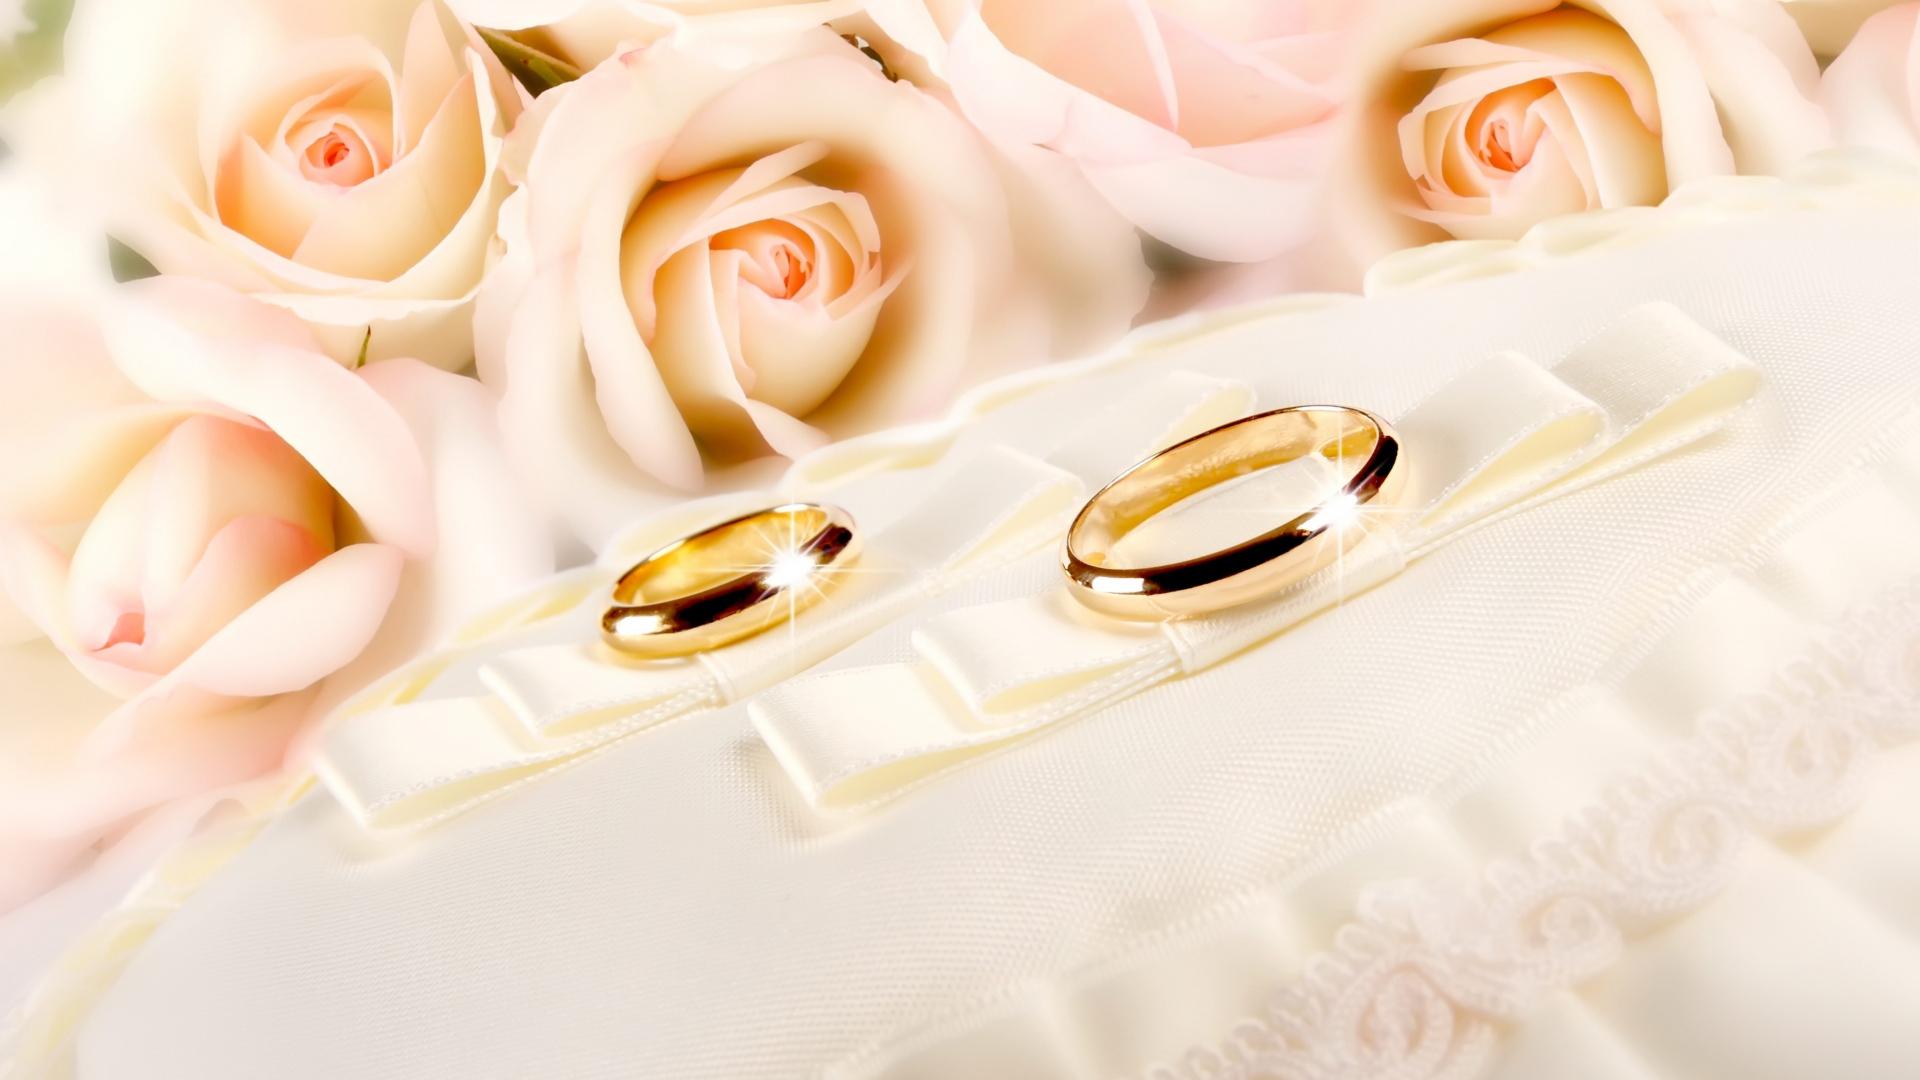 Download Wallpaper 1920x1080 Rings Wedding Gold Glitter Fabric Flower Rose Full Hd 1080p Hd Background